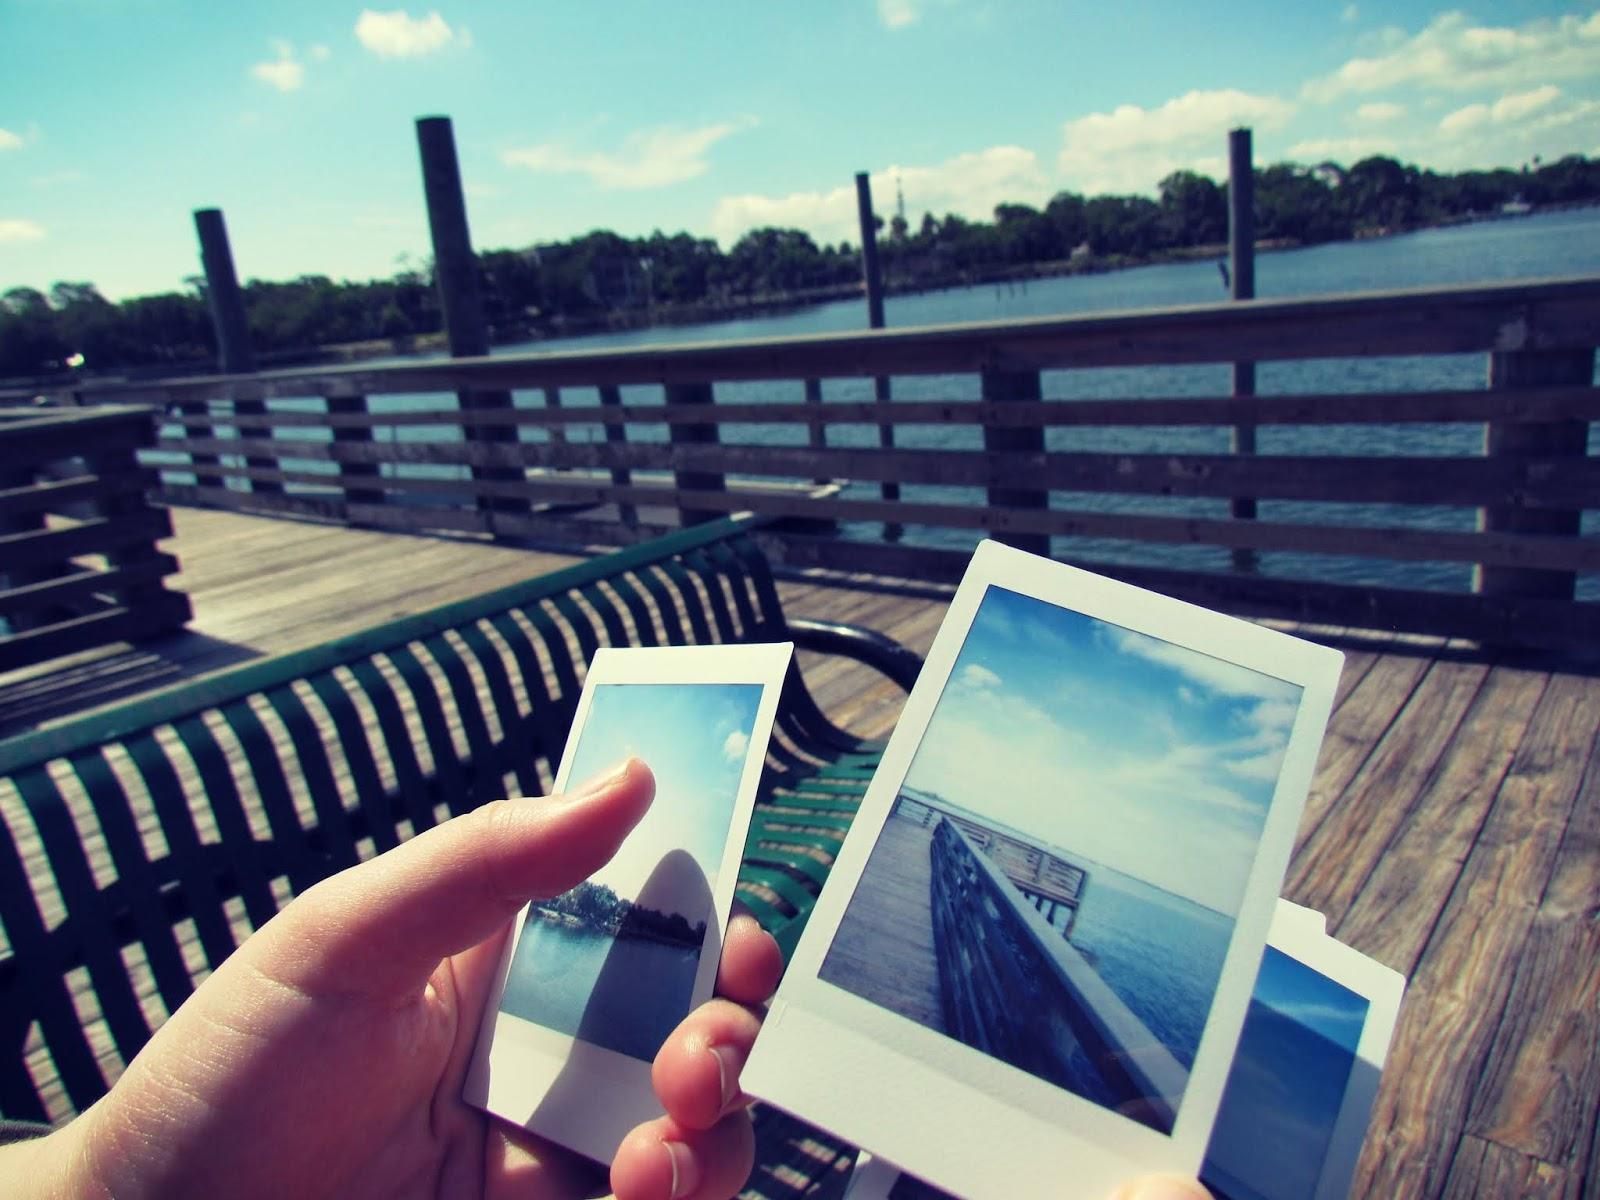 Vintage-Inspired Florida Lifestyle, Slow Living Pics